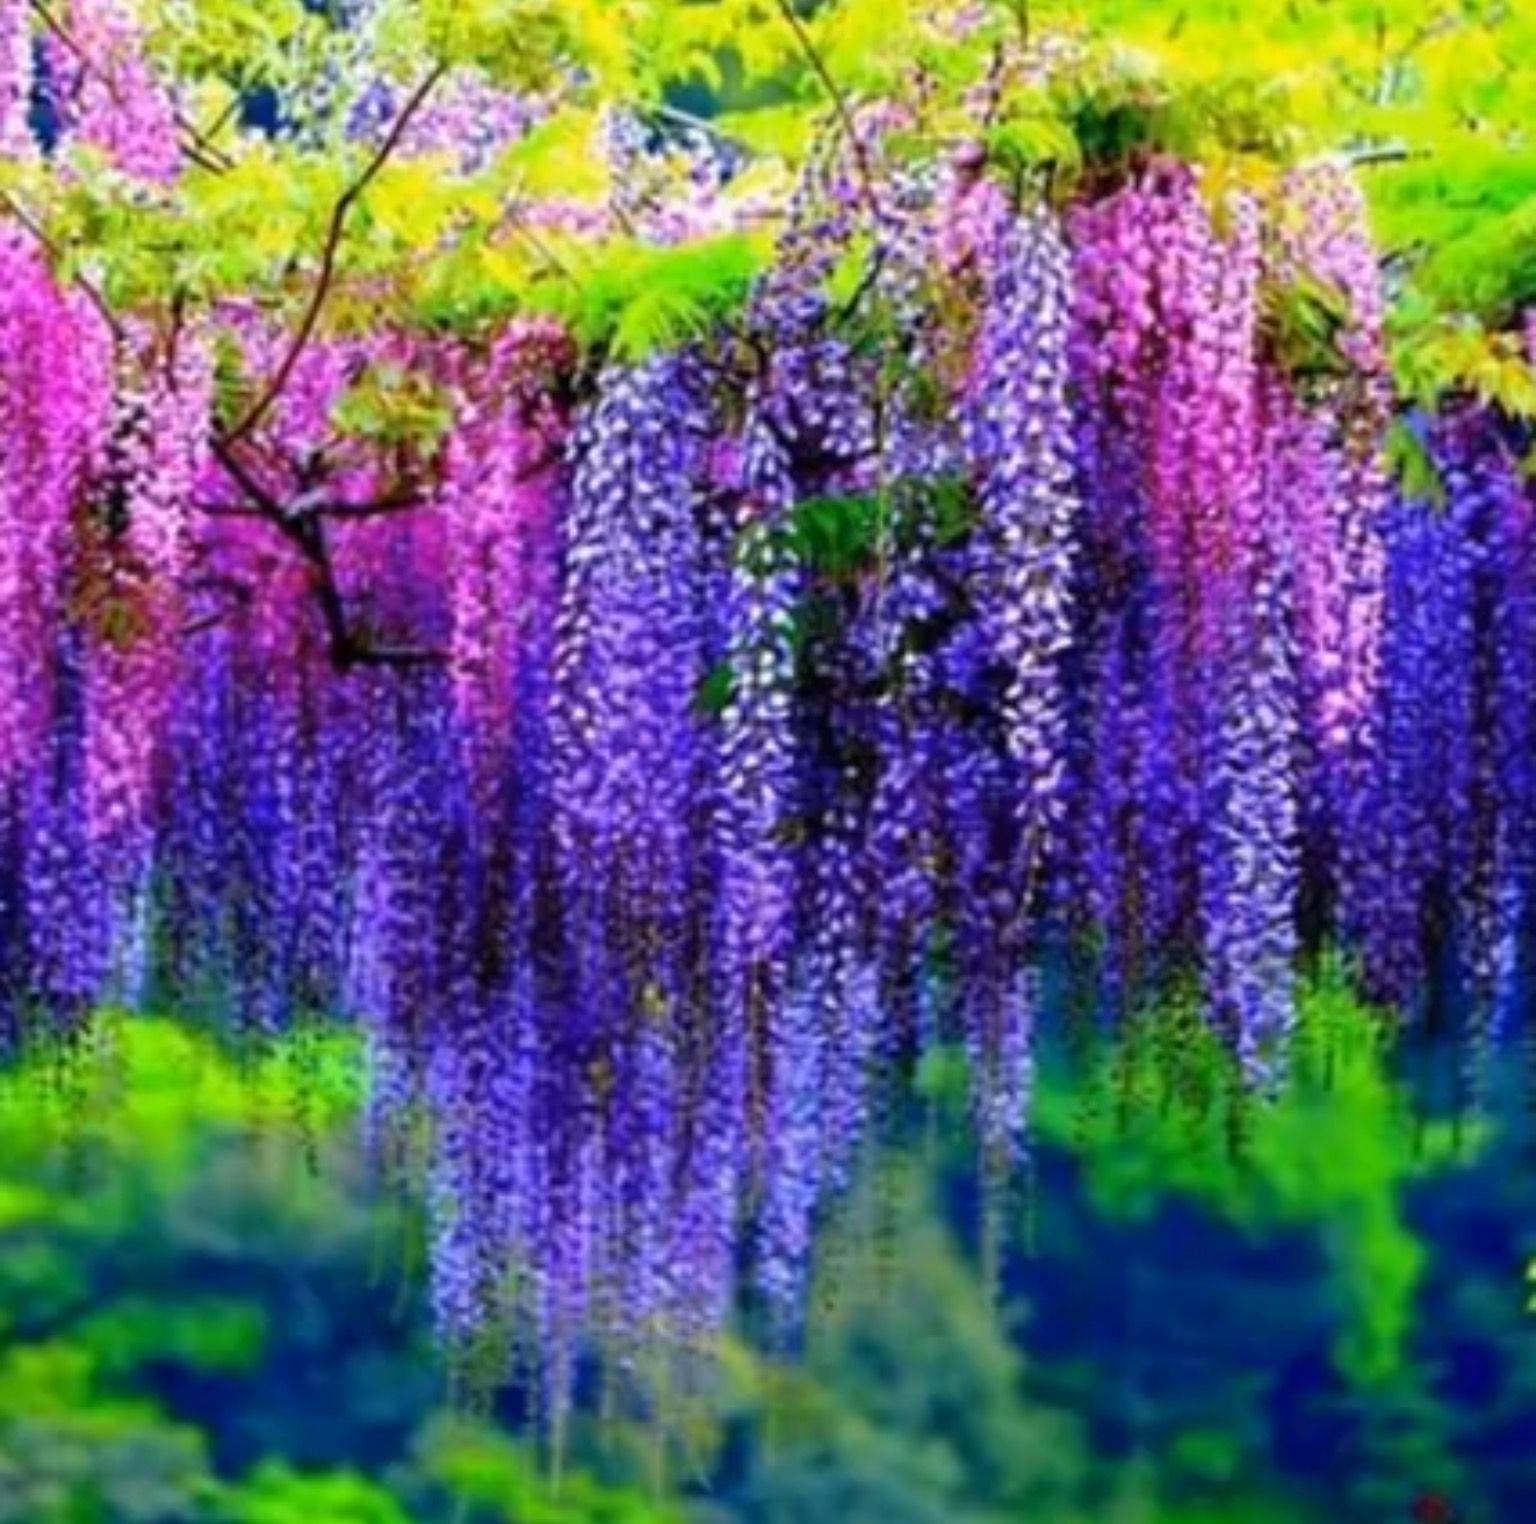 Radiant Magenta And Violet Wisteria Flowers Wisteria Wonderful Flowers Flower Landscape